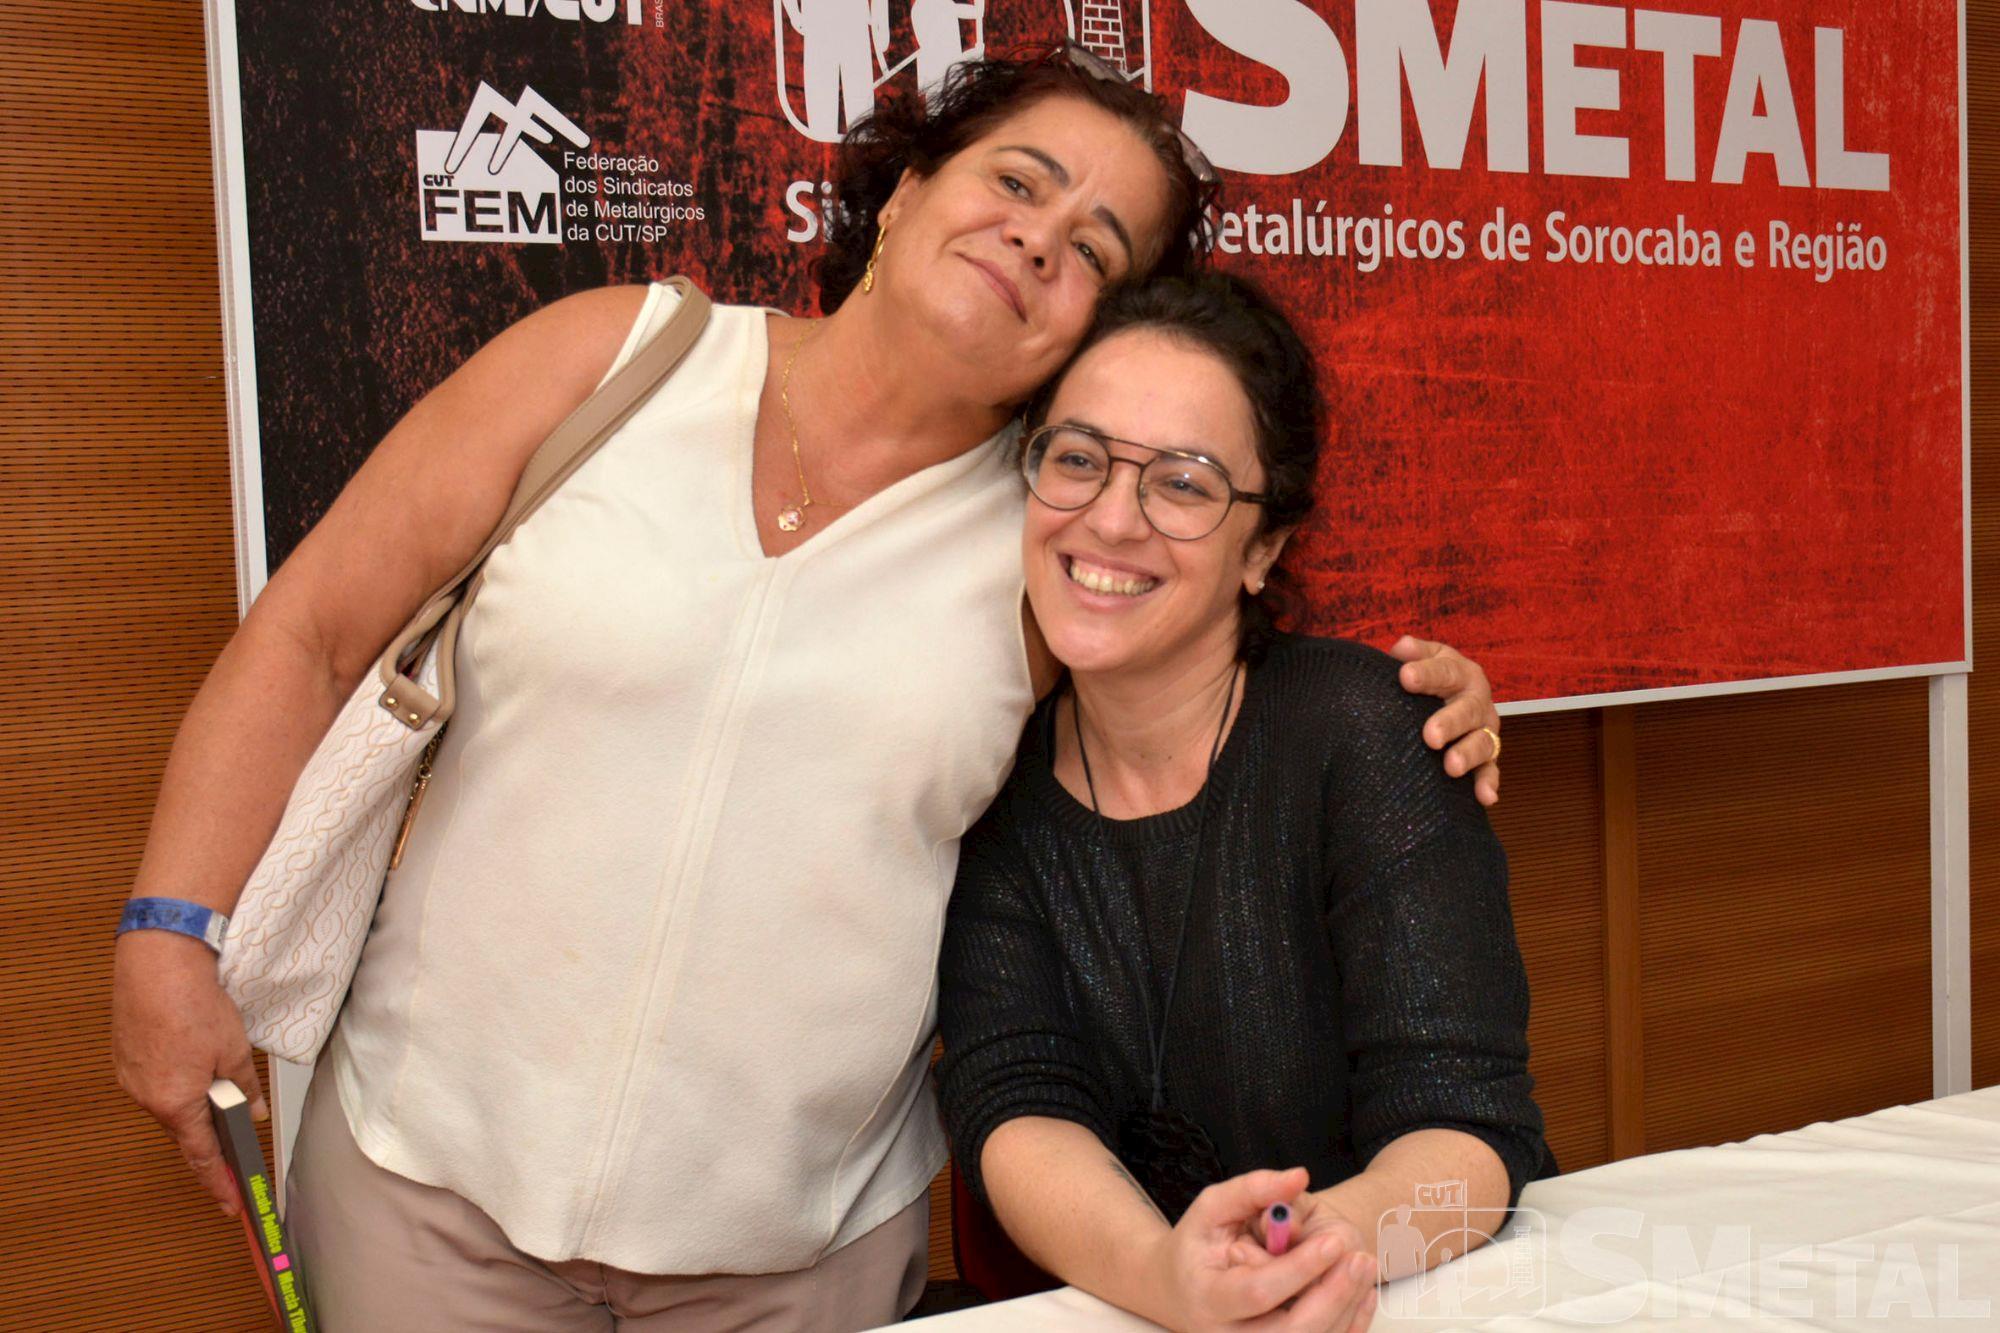 Palestra de Marcia Tiburi lota auditório do SMetal, marcia,  palestra,  tiburi,  smetal, Foguinho/Imprensa SMetal, Confira as fotos da palestra de Marcia Tiburi no SMetal